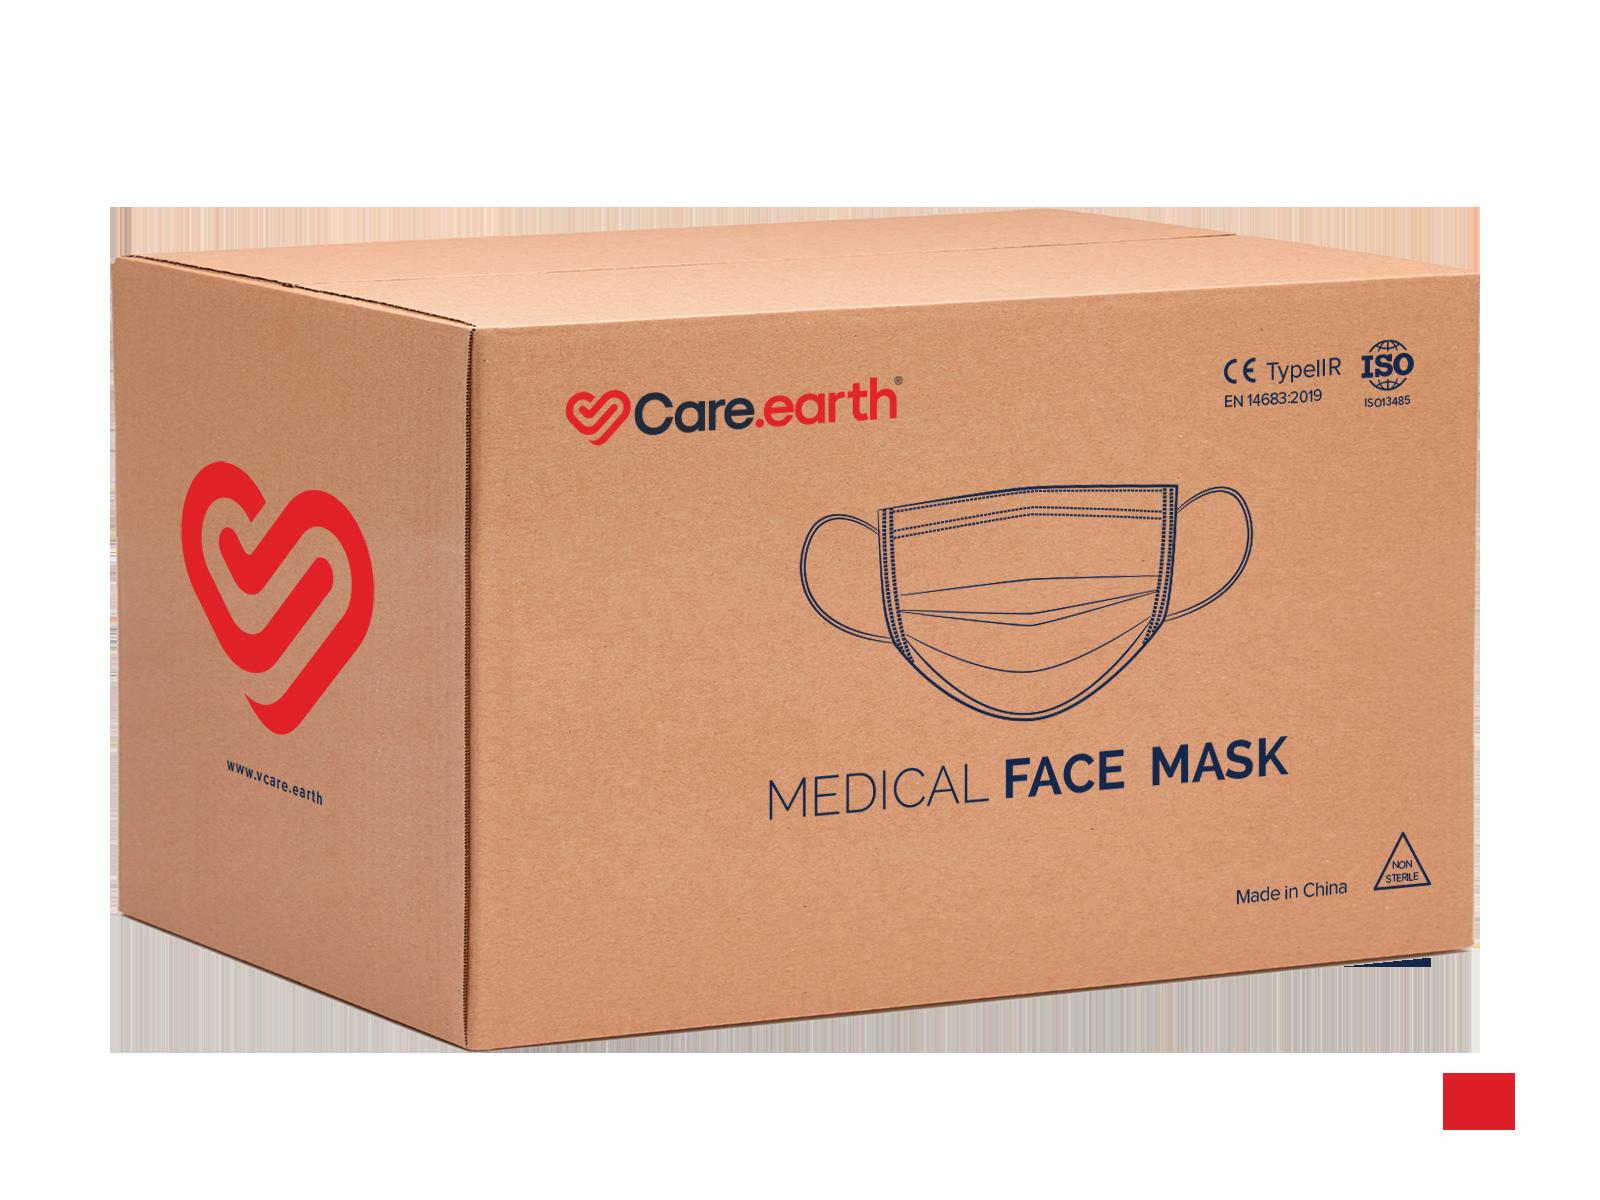 Vcare Earth MFMASK 1M GEM Master Box